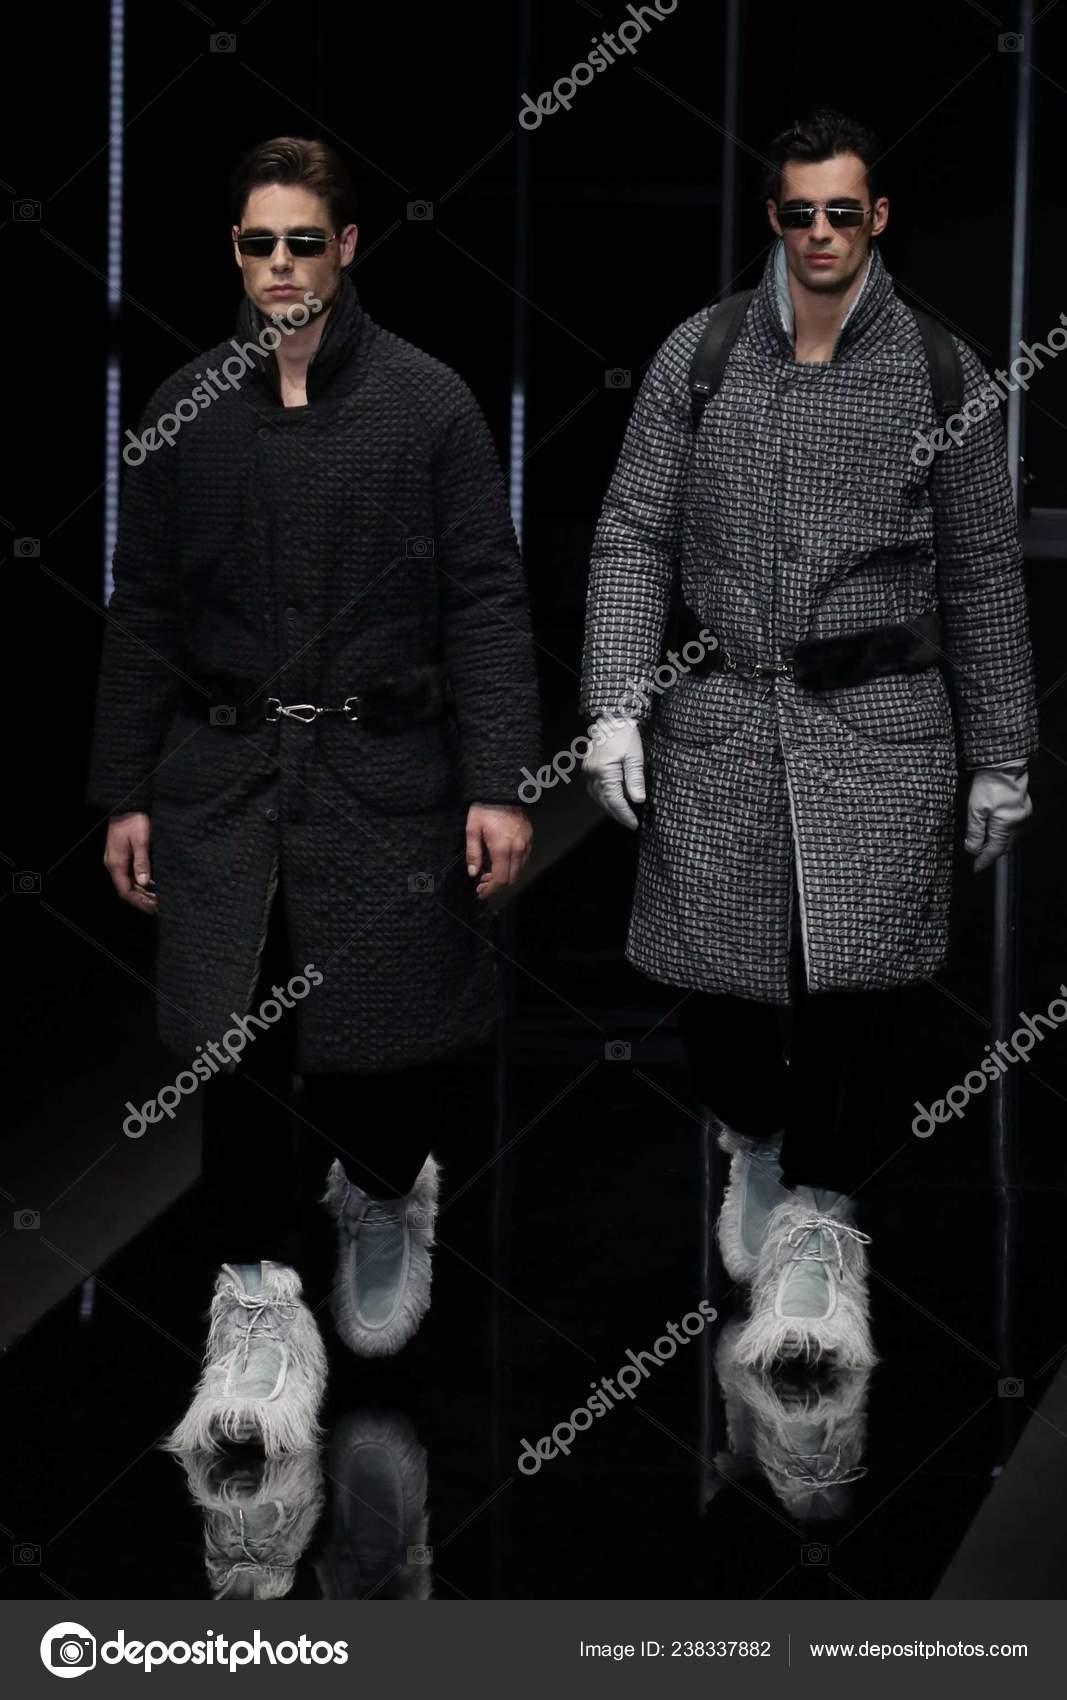 37497c17fe Μοντέλα παρουσιάζουν νέες δημιουργίες στο Emporio Armani επίδειξη μόδας  κατά τη διάρκεια της Milan ανδρών μόδα εβδομάδα Φθινόπωρο Χειμώνας 2019 στο  Μιλάνο ...